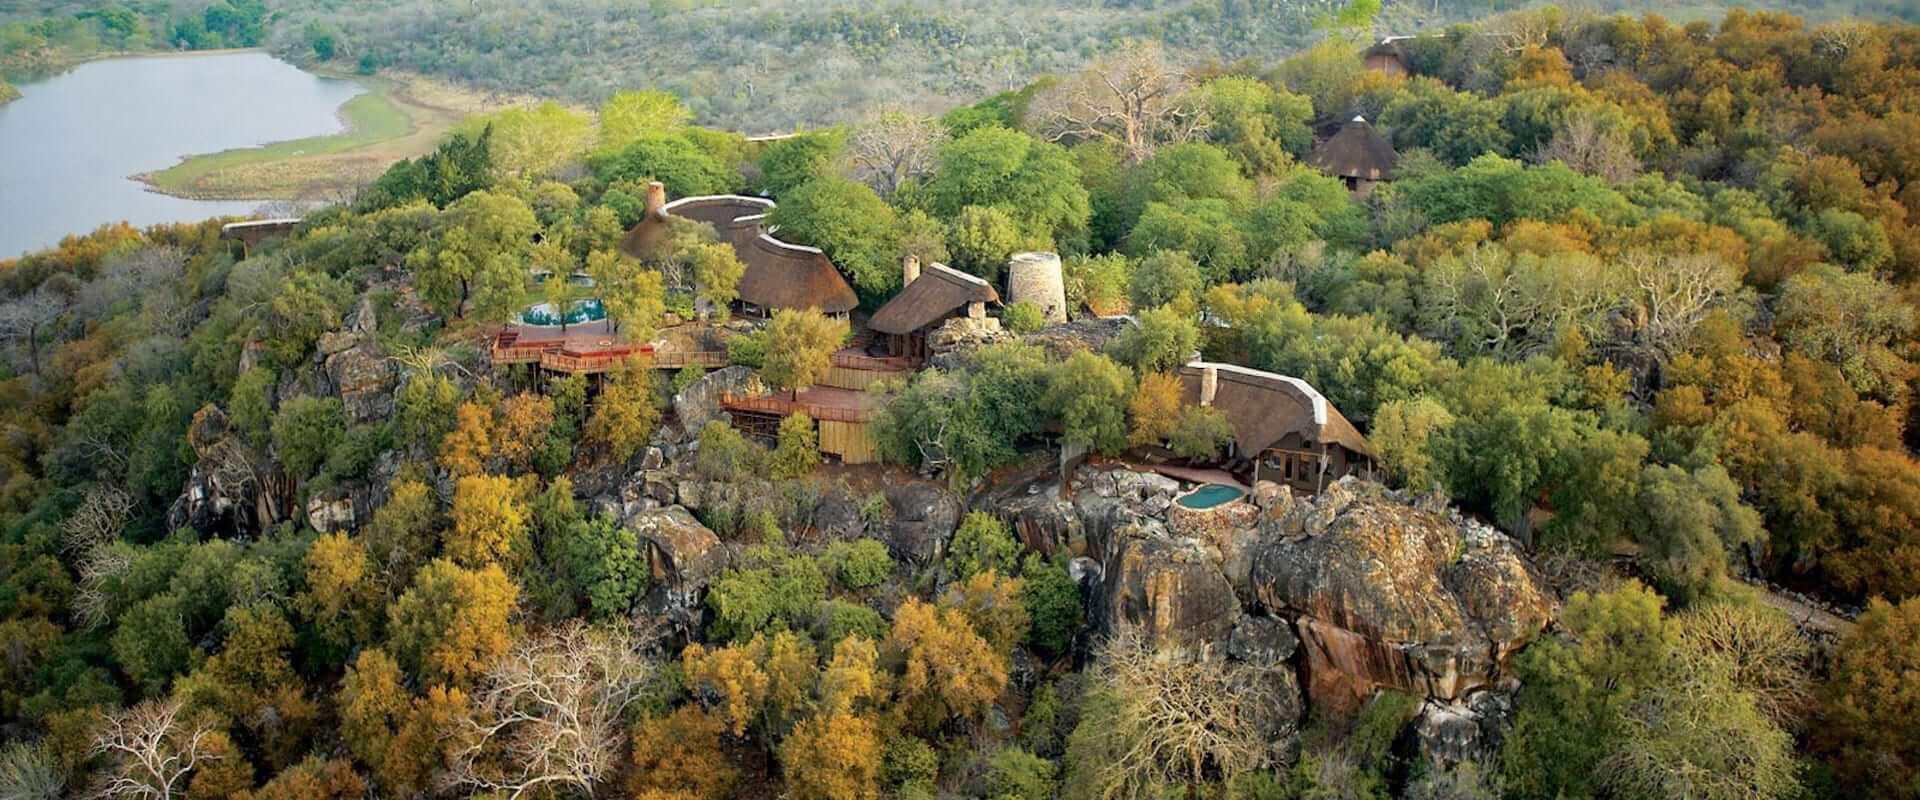 zimbabwe africa viajar emiratos